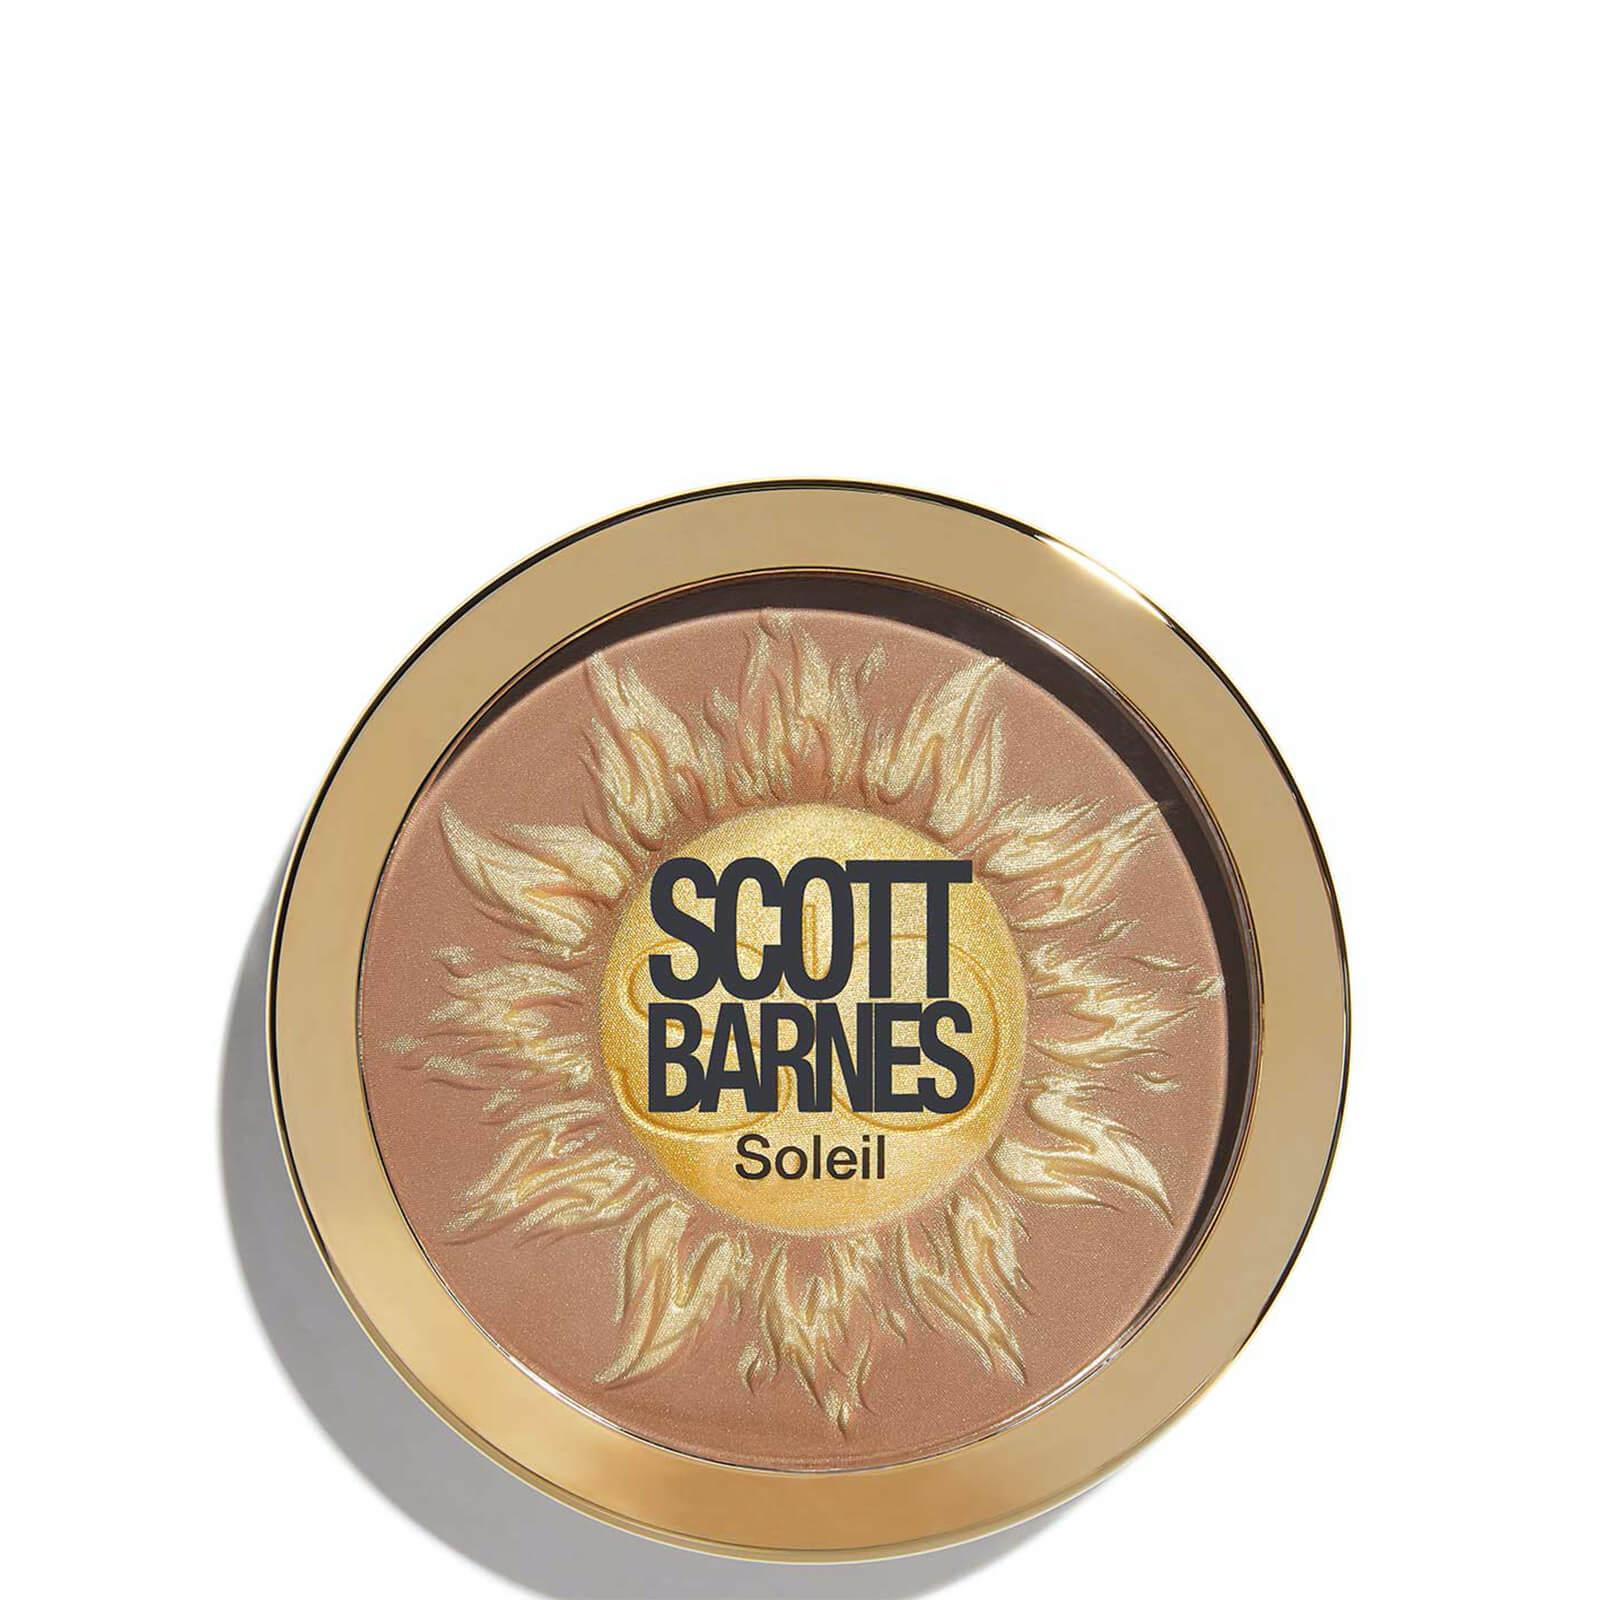 Купить Бронзер Scott Barnes Soleil Bronzer (различные оттенки) - Bondi Beach